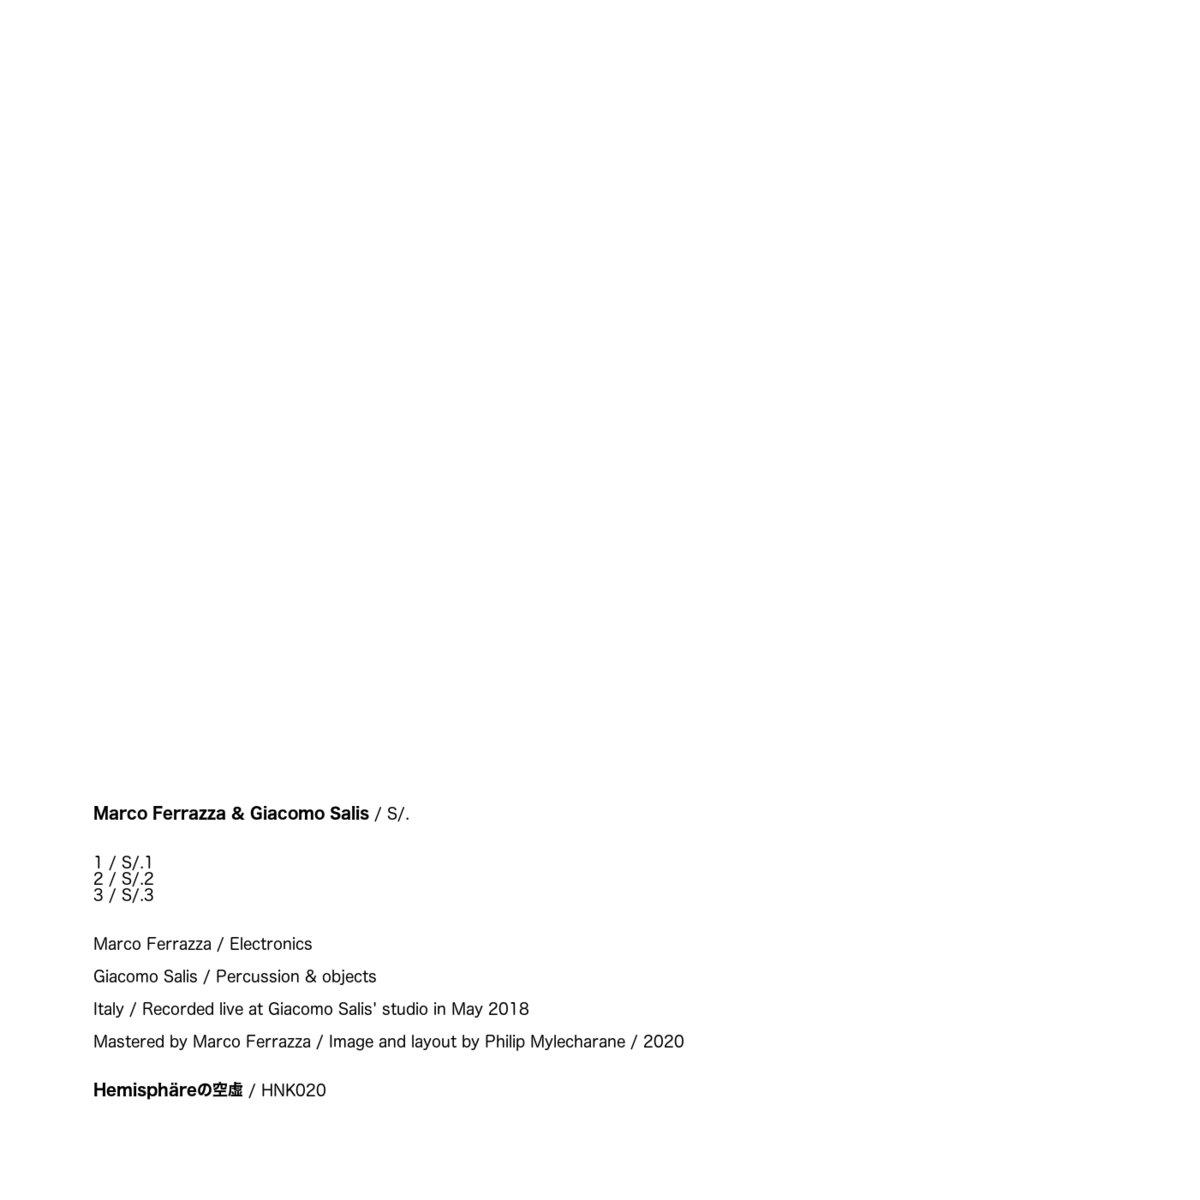 Giacomo Salis - Marco Ferrazza - S/. - Hemisphäre - Bandcamp - player - 2020 - Sa Scena Sarda - 30 Ottobre 2020